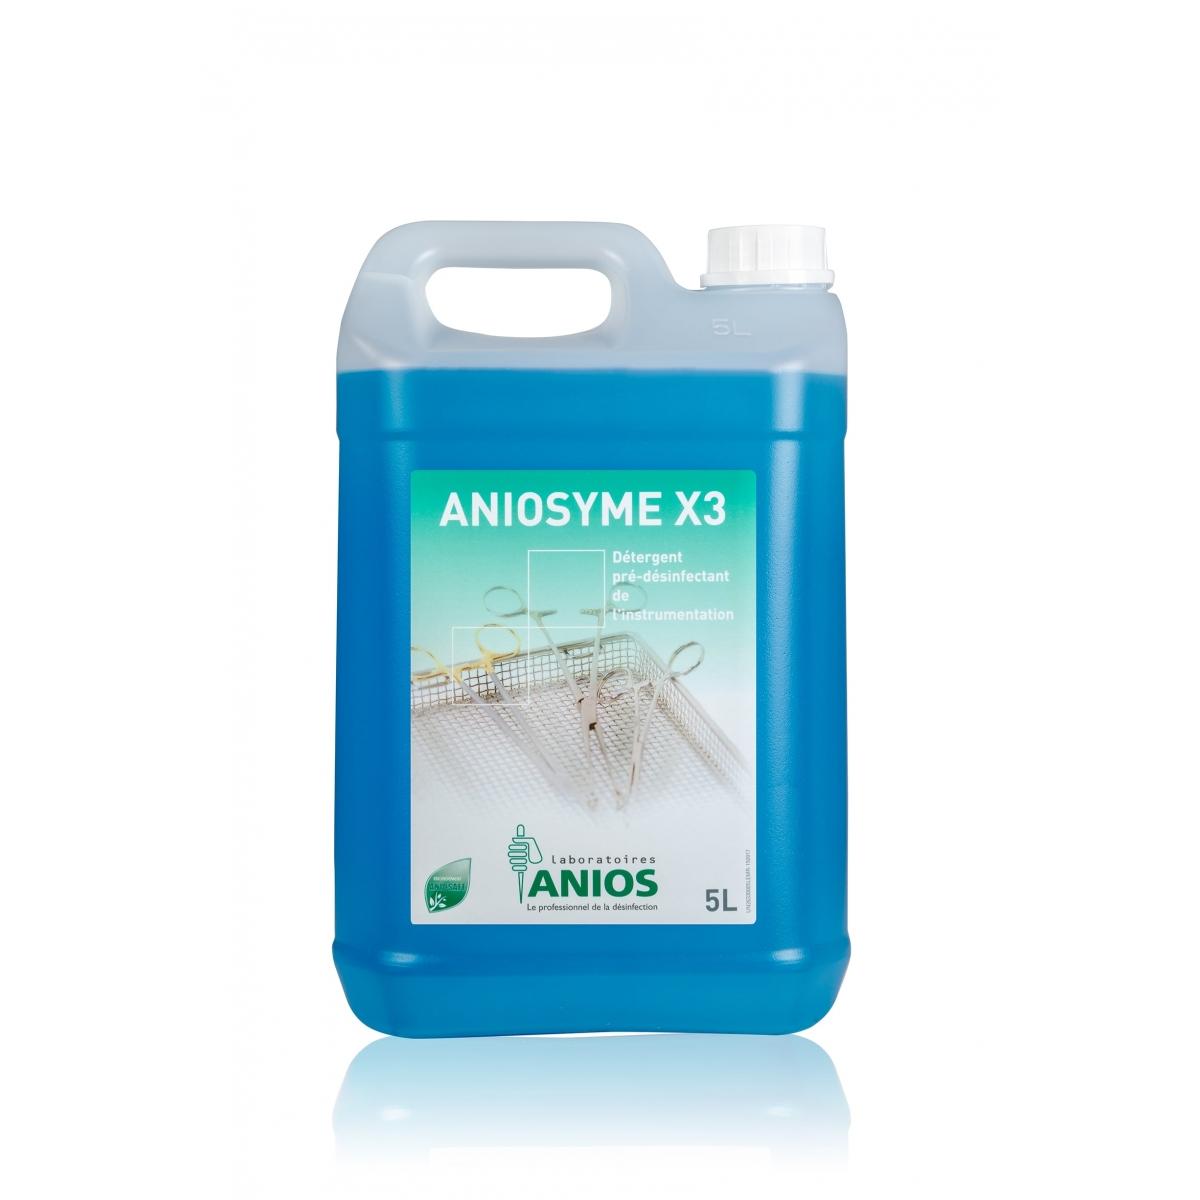 Nettoyage - ANIOSYME X3 5 L